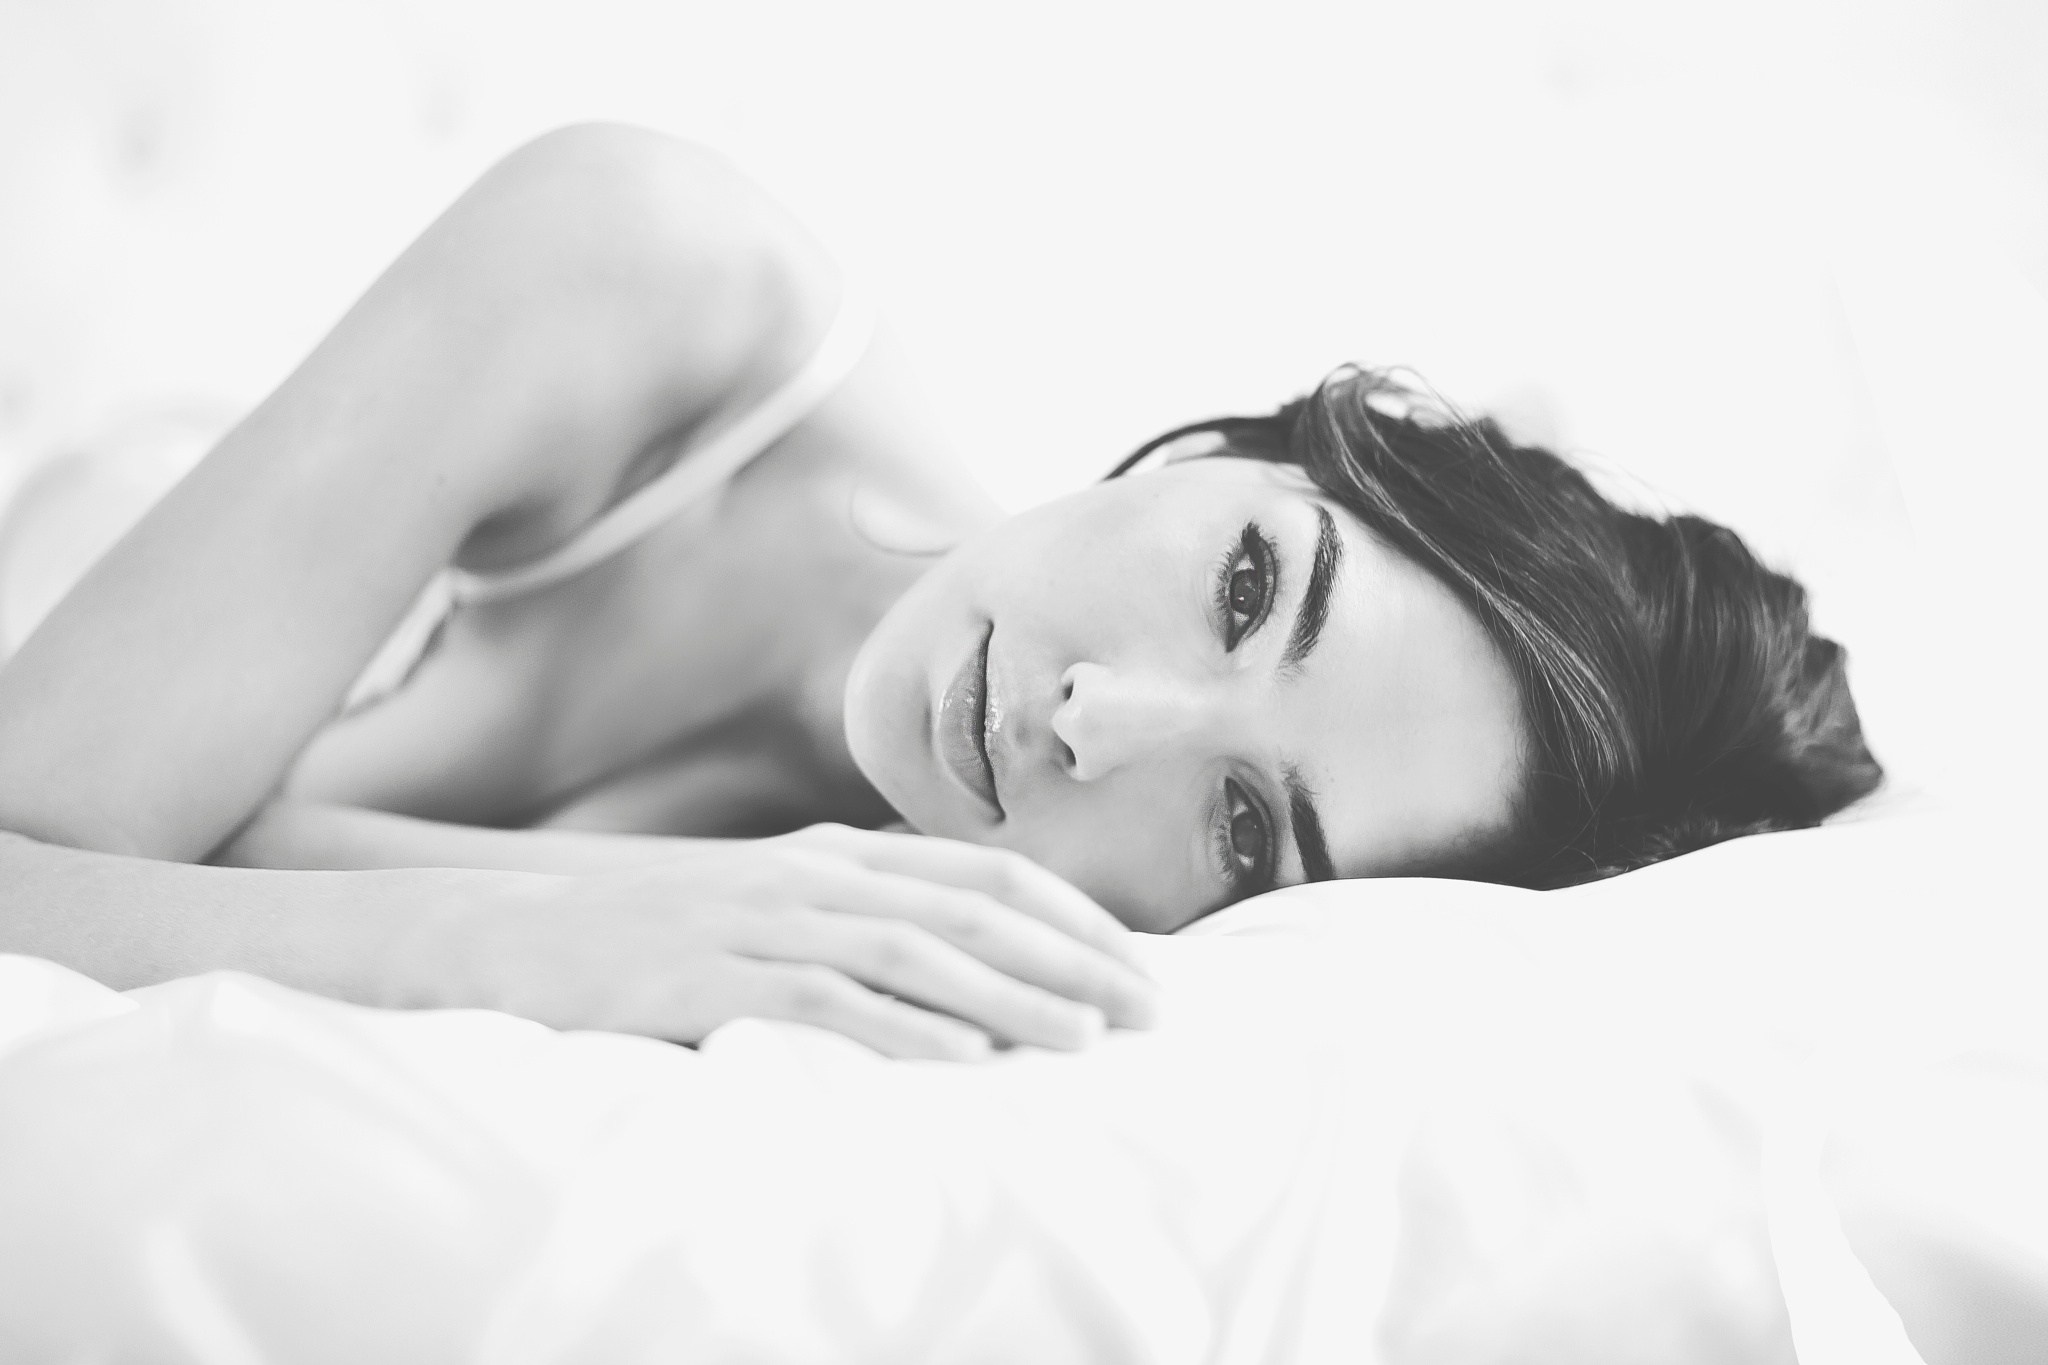 Gal Gadot by Ian Photography